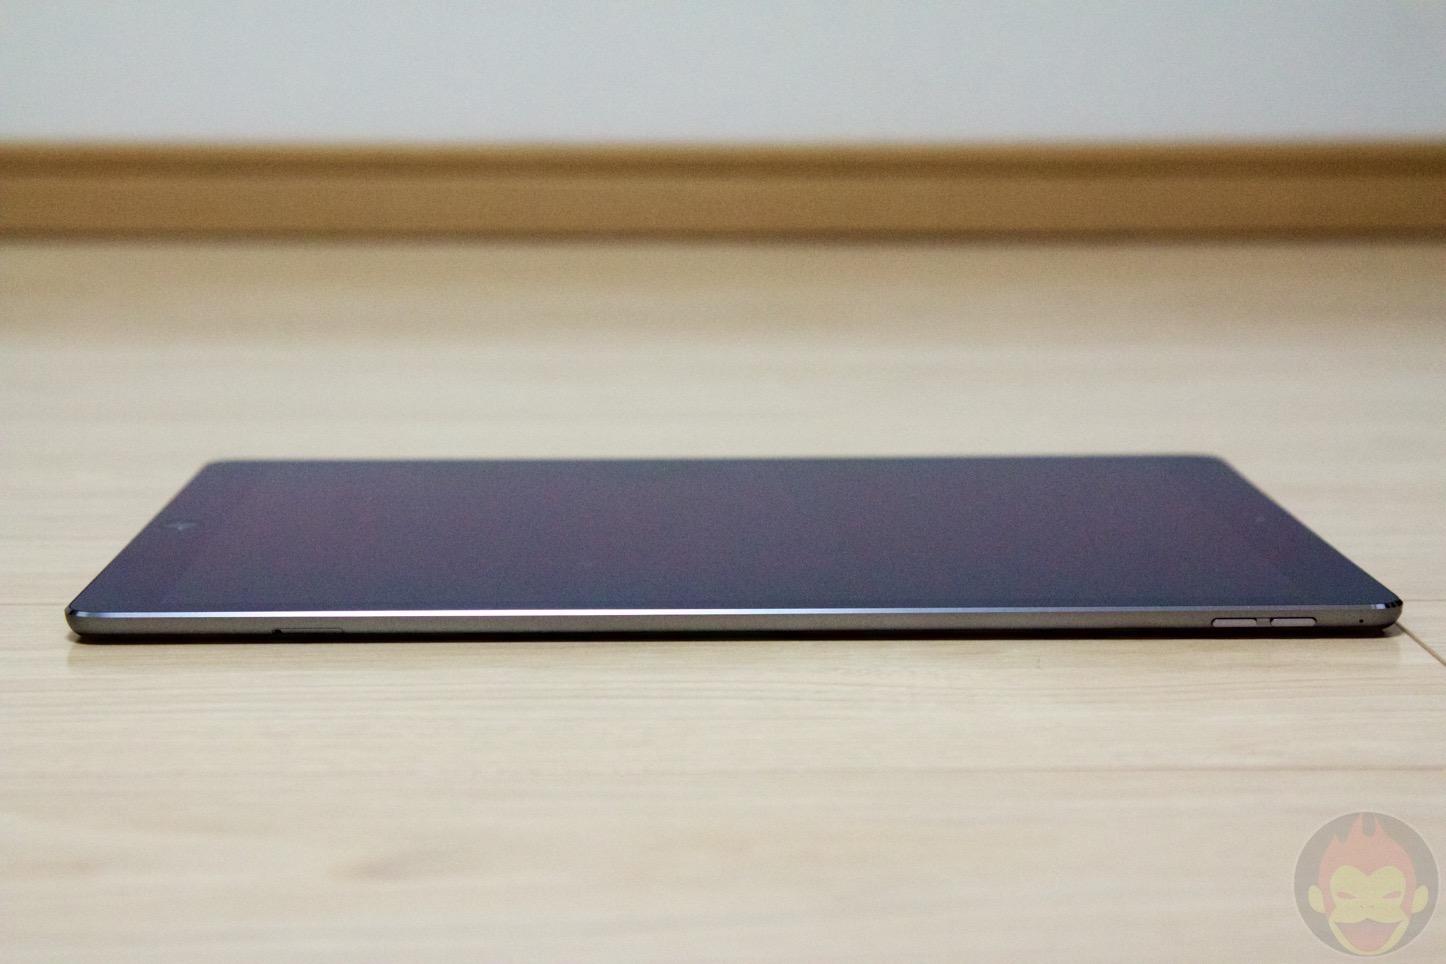 iPad-Pro-Unboxing-09.jpg